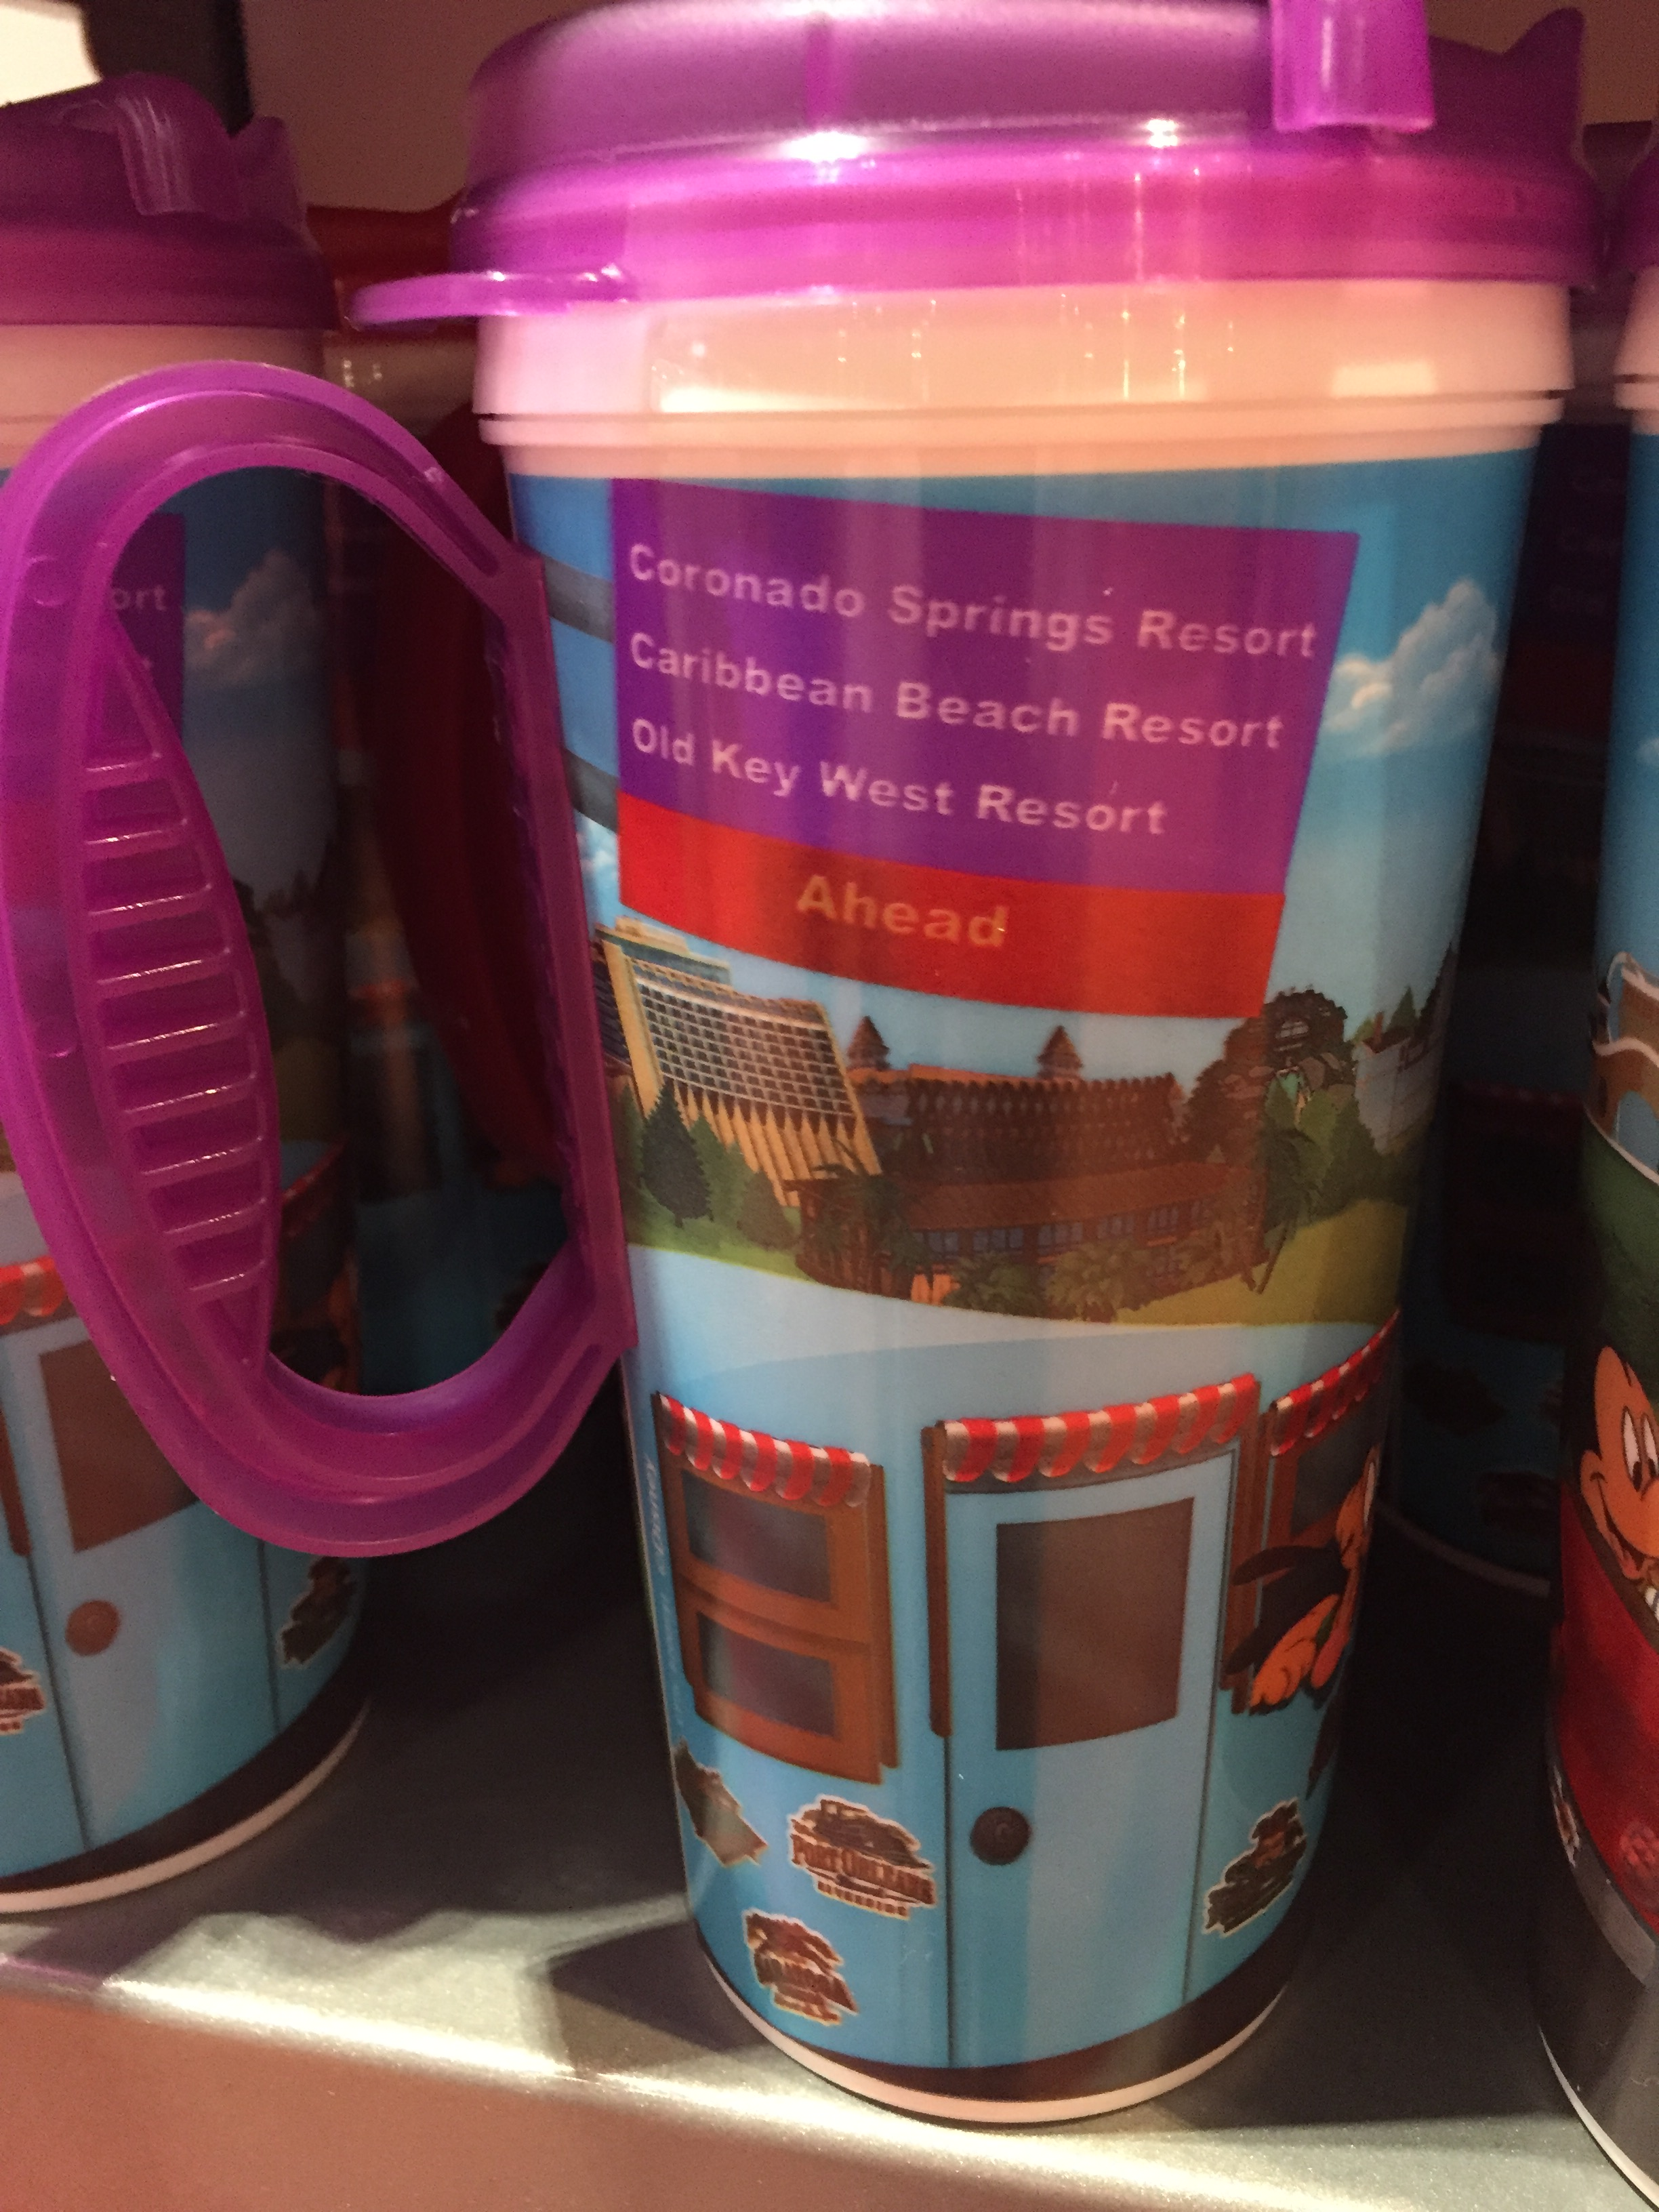 Walt Disney World Brings Back Refillable Mugs With Handles